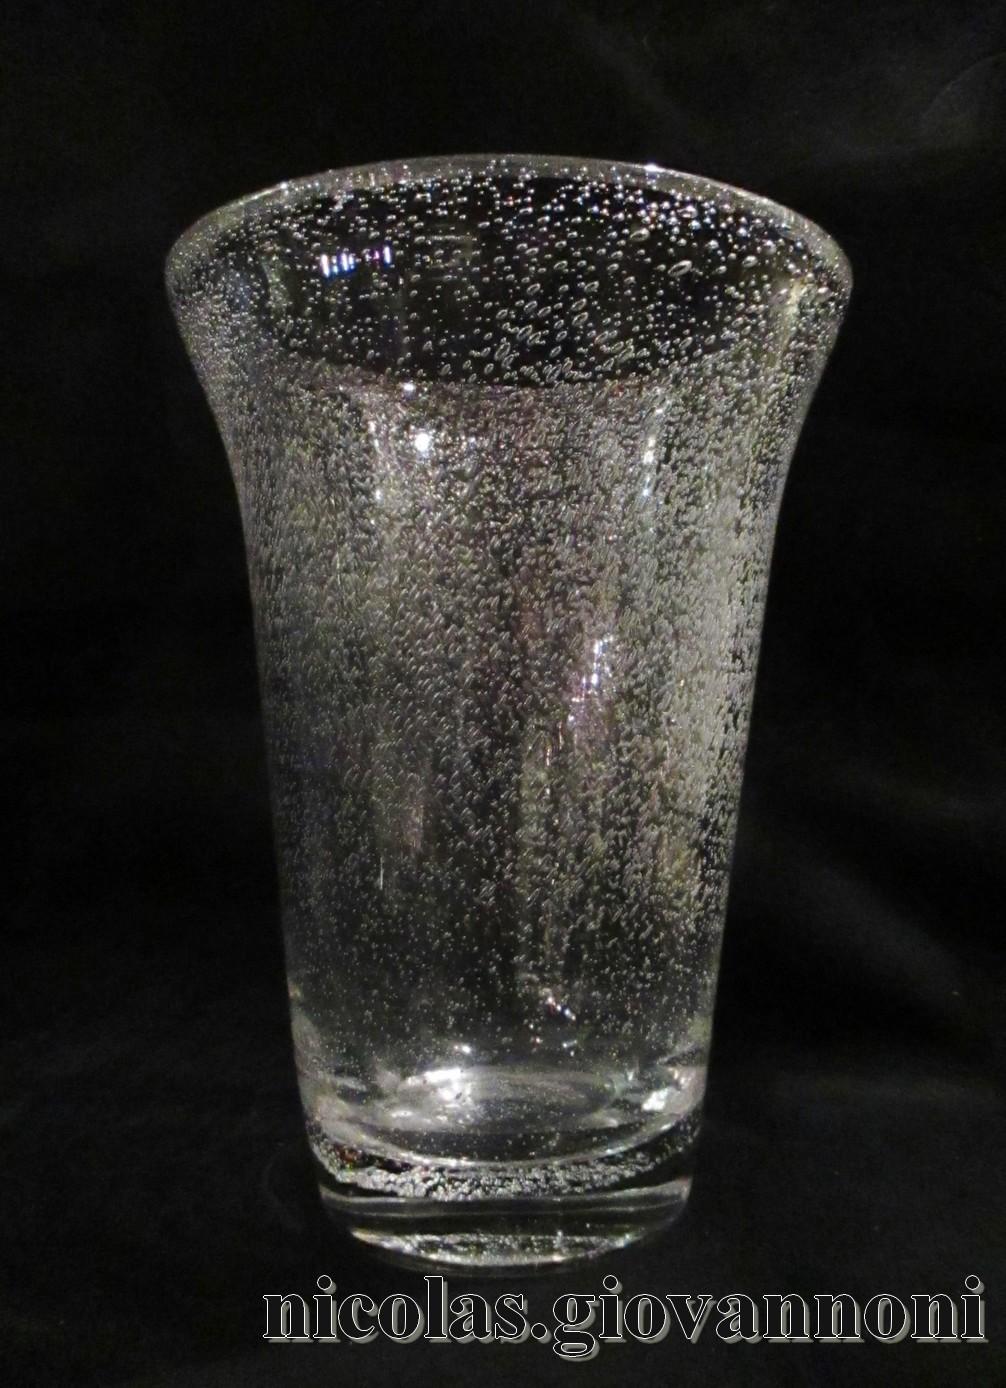 vase 34 5 cm verre bull 1930 daum vases catalogue cristal de france nicolas giovannoni. Black Bedroom Furniture Sets. Home Design Ideas